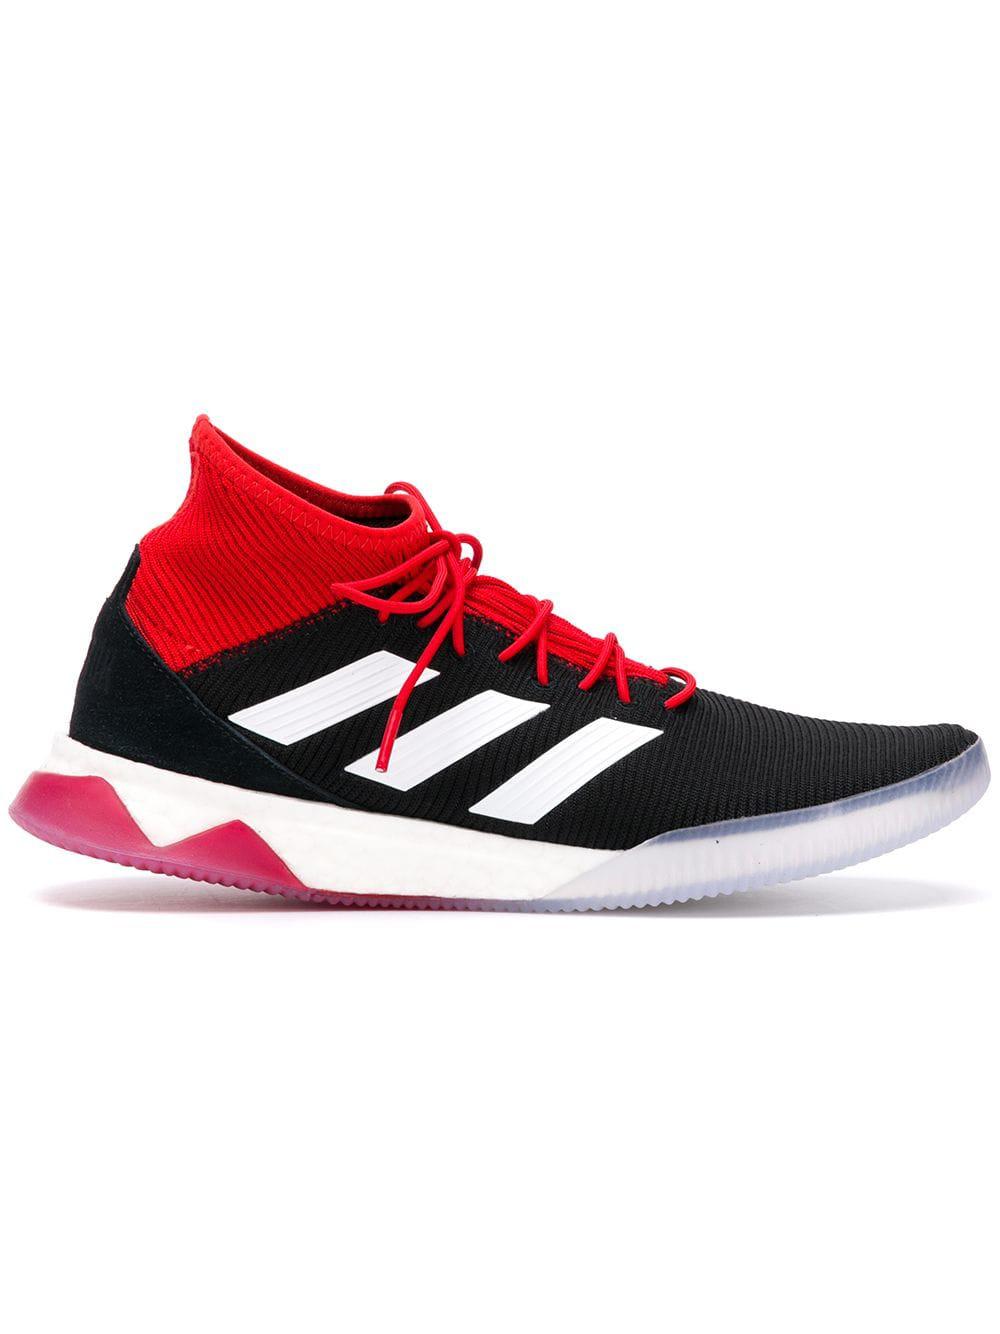 904ab321471f Adidas Originals Adidas Predator Tango 18.1 Sneakers - Black